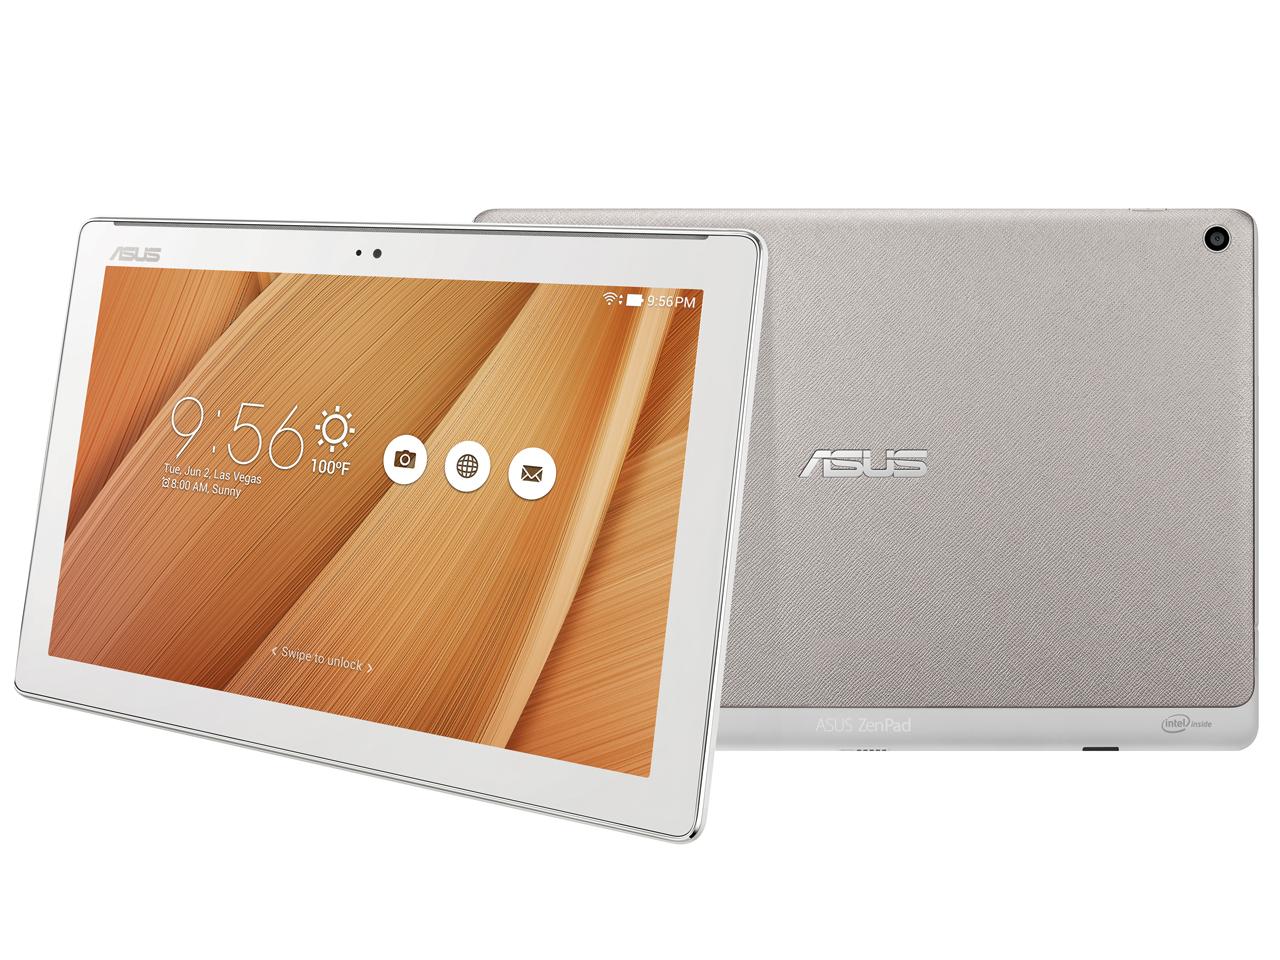 ASUS ZenPad 10 Z300C-SL16 [シルバー] の製品画像